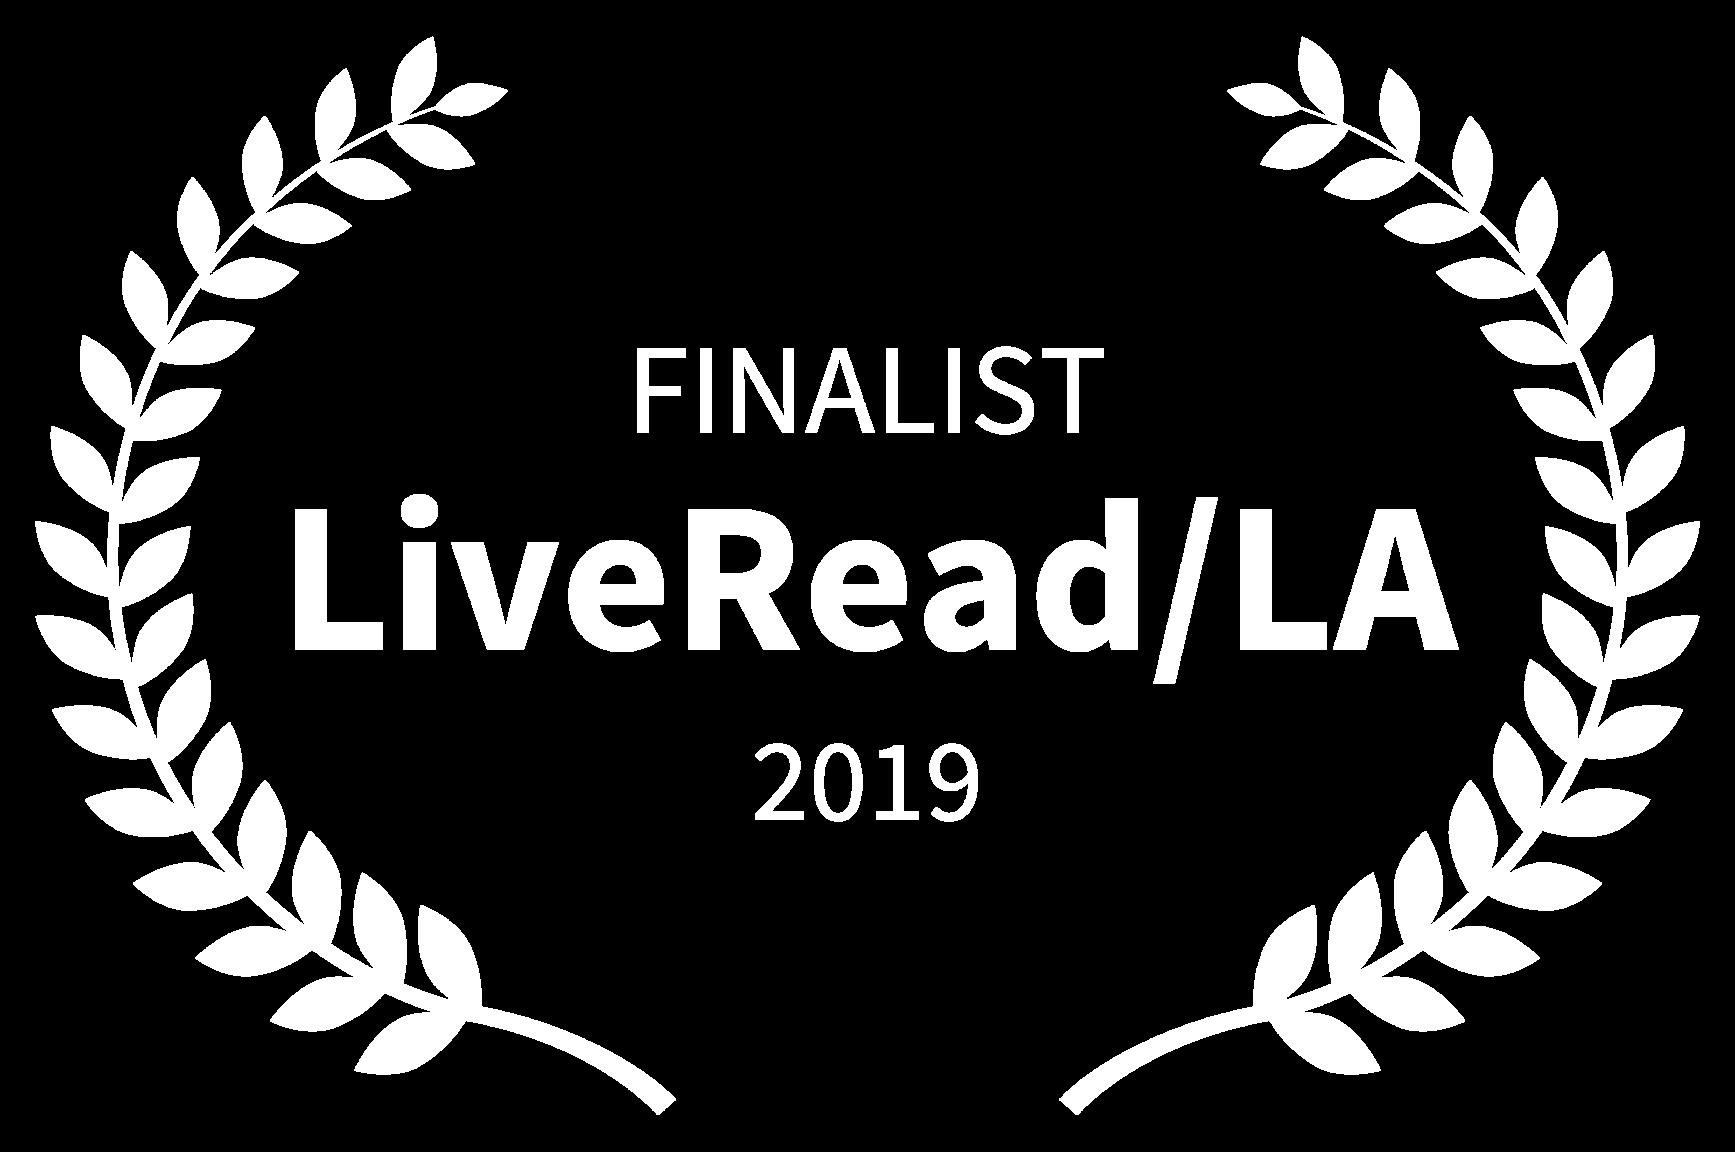 FINALIST-LiveReadLA-2019_Black